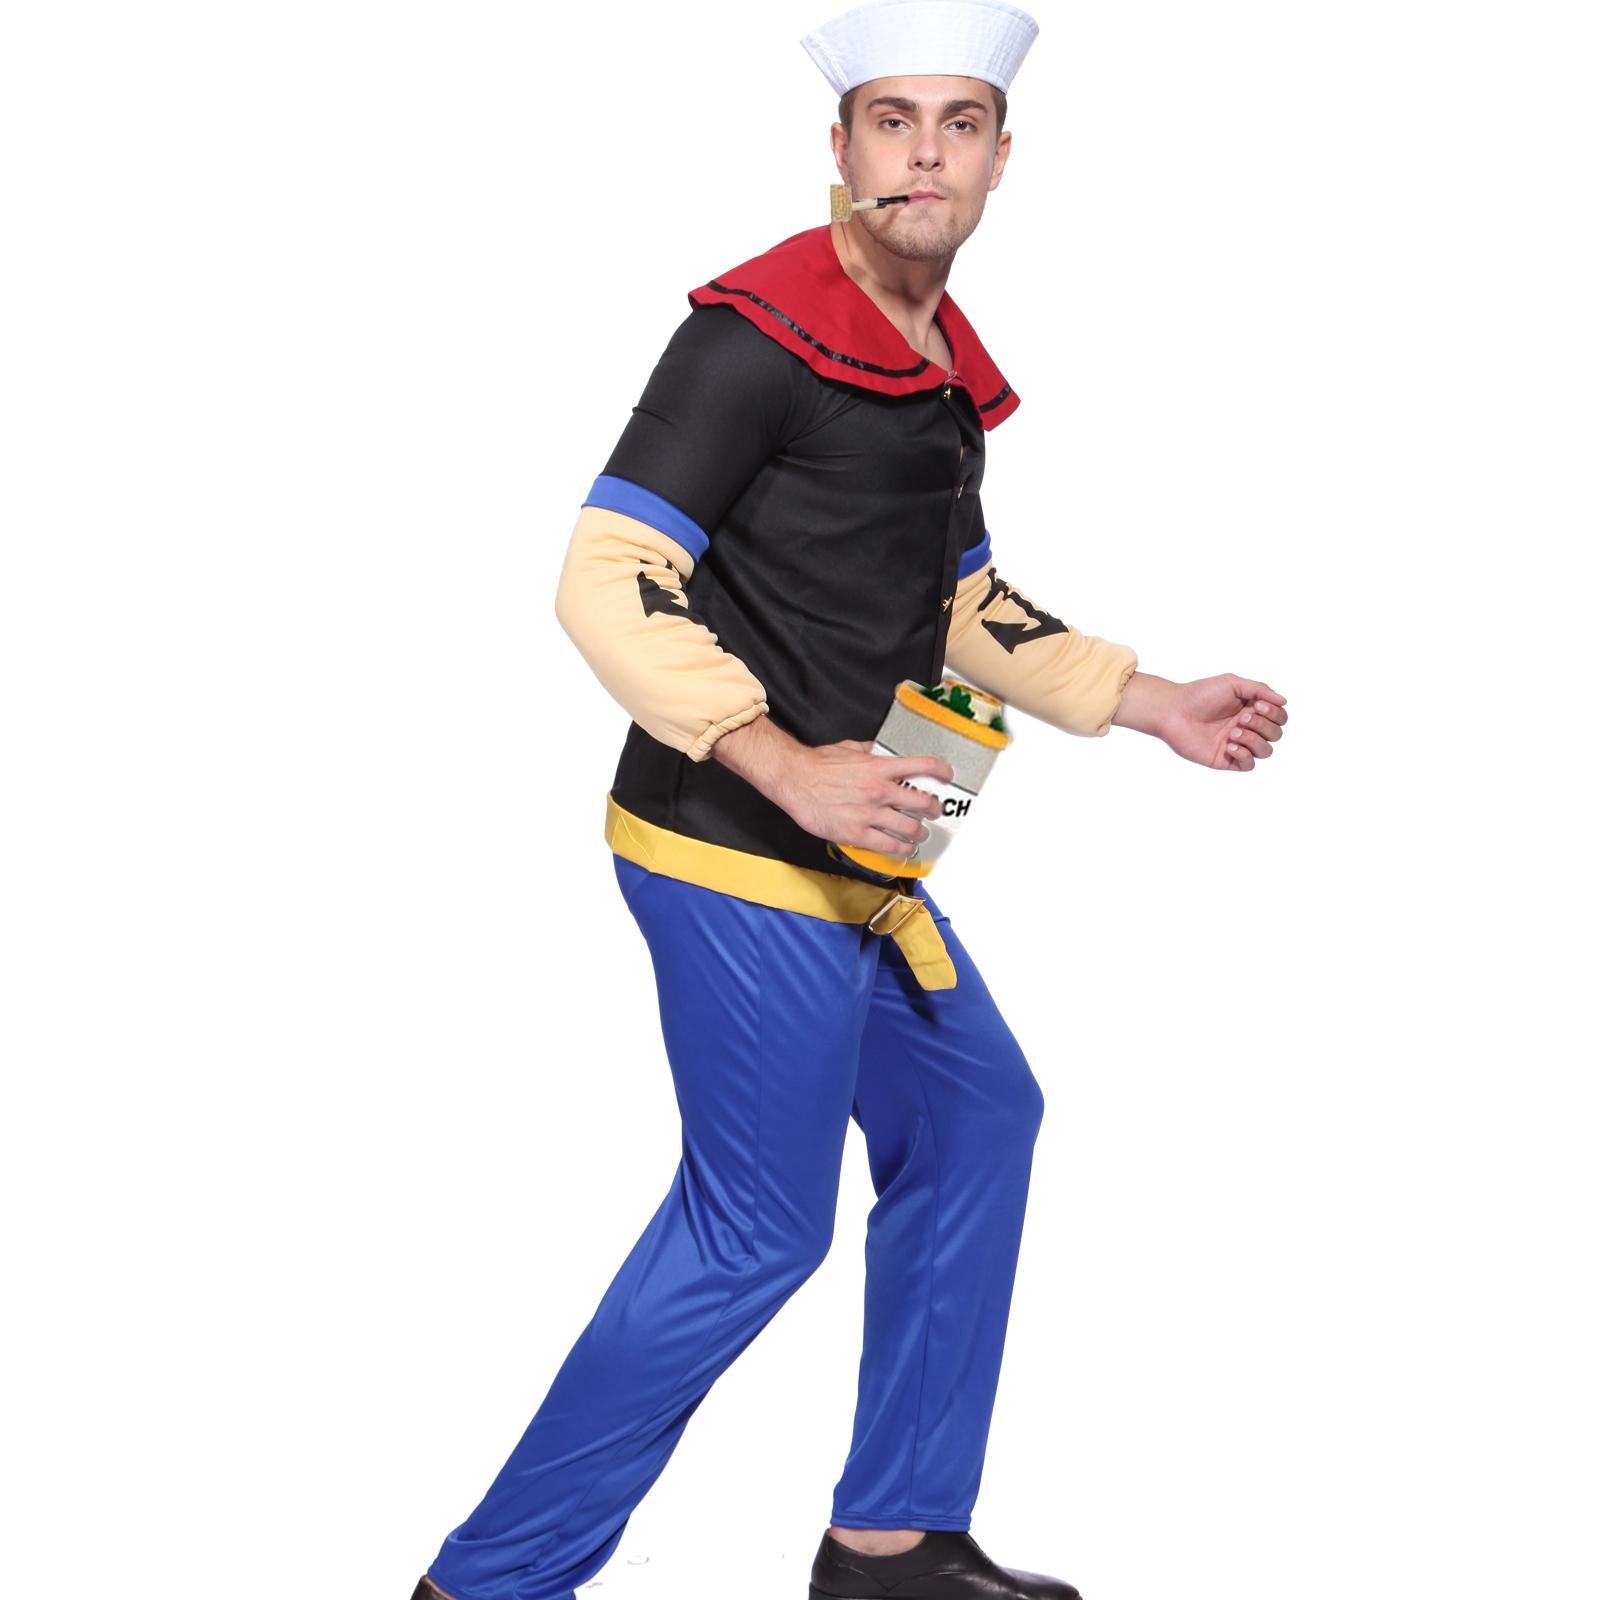 lustig herren karneval verkleidung popeye kost m matrose der seemann gr e m ebay. Black Bedroom Furniture Sets. Home Design Ideas